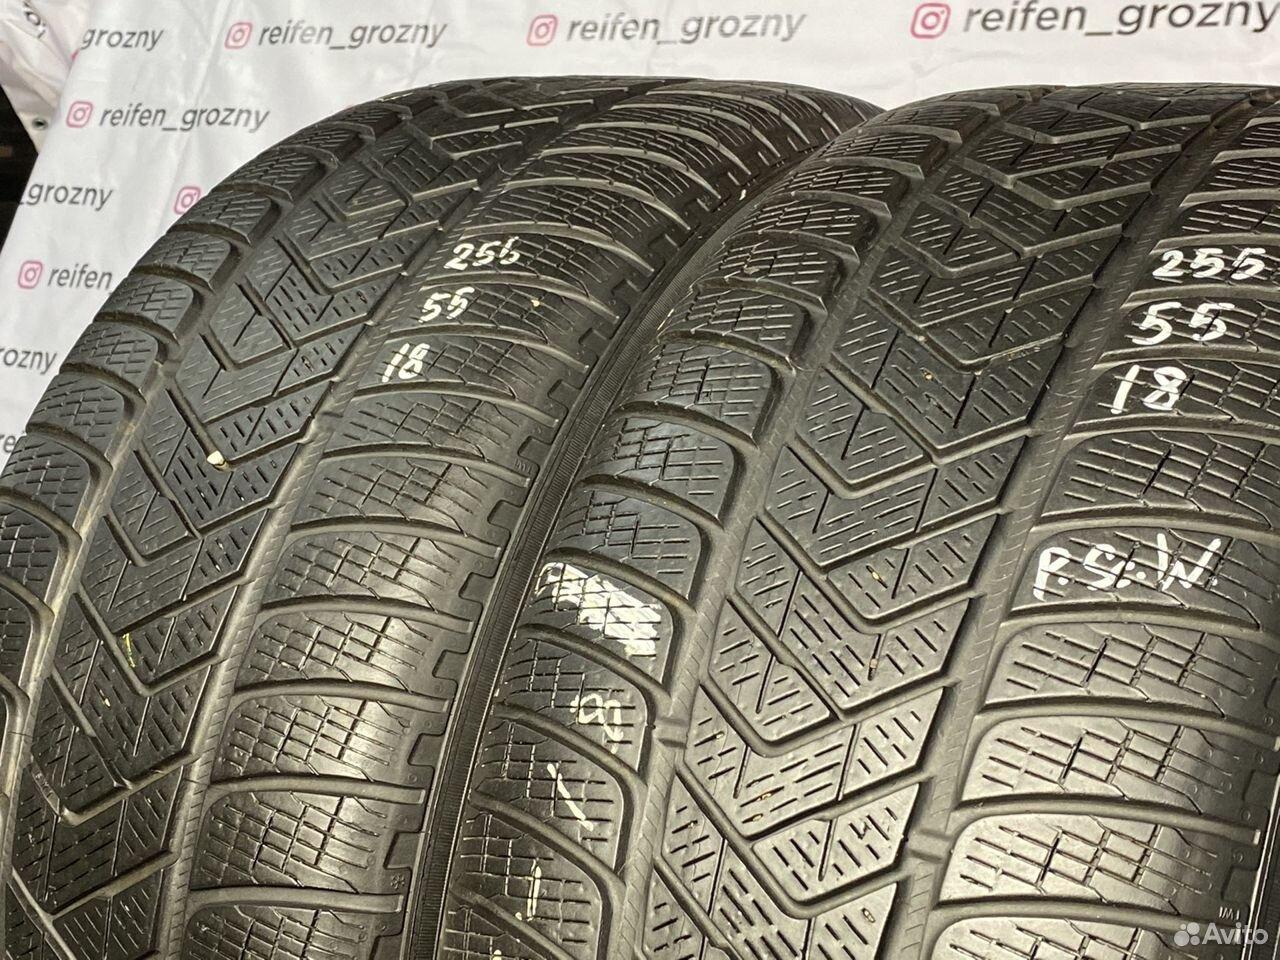 255/55/18 Pirelli Scorpion Winter - 2 шт  89380001718 купить 1